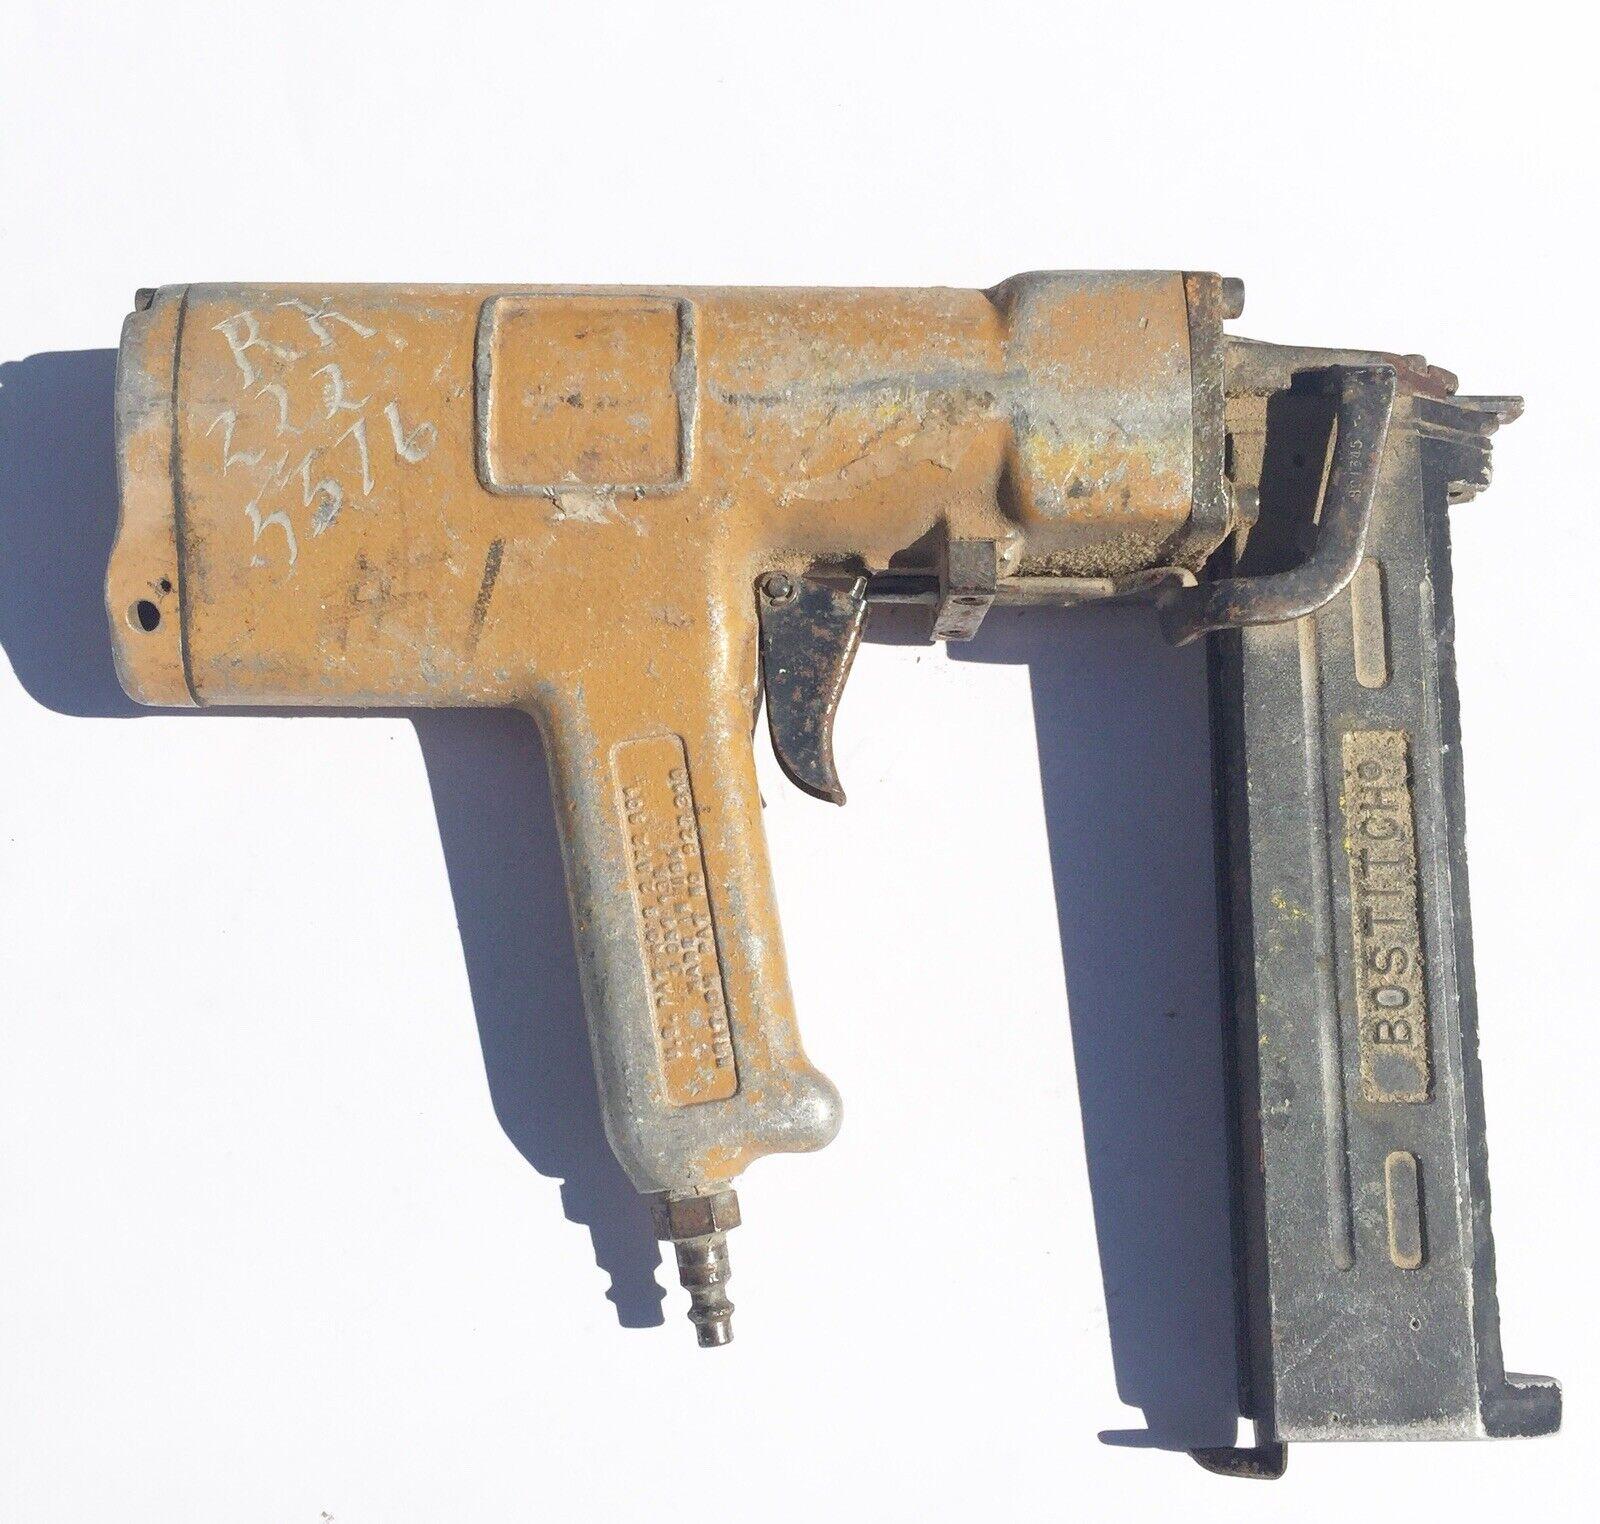 Bostitch MIII pneumatic nail gun BC907A MIII812CNCT Concrete